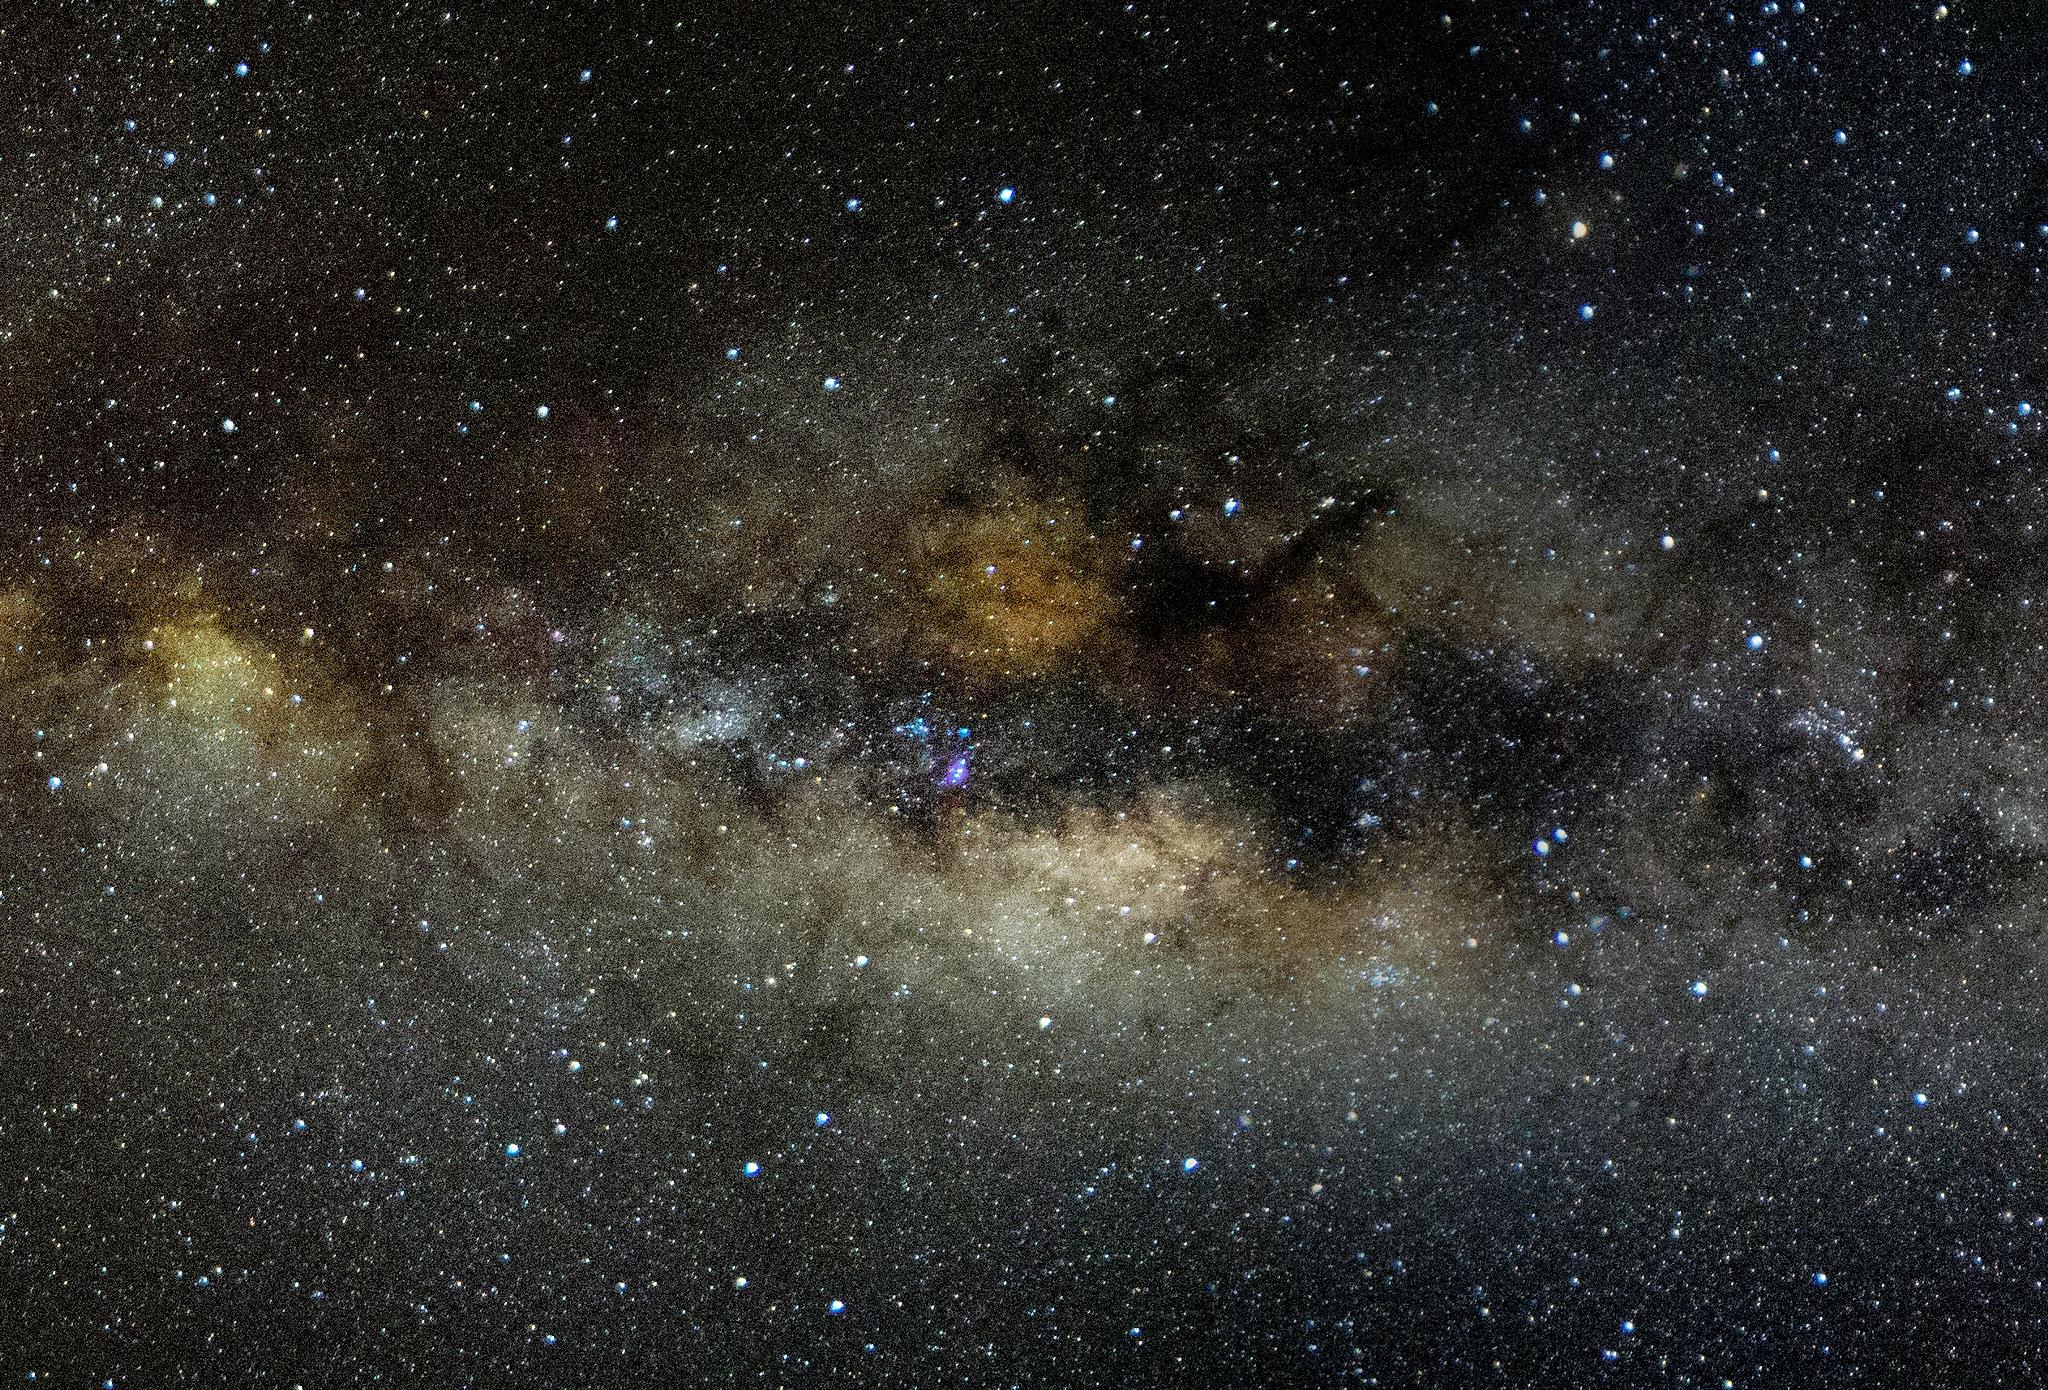 Milky Way by Graham Levi